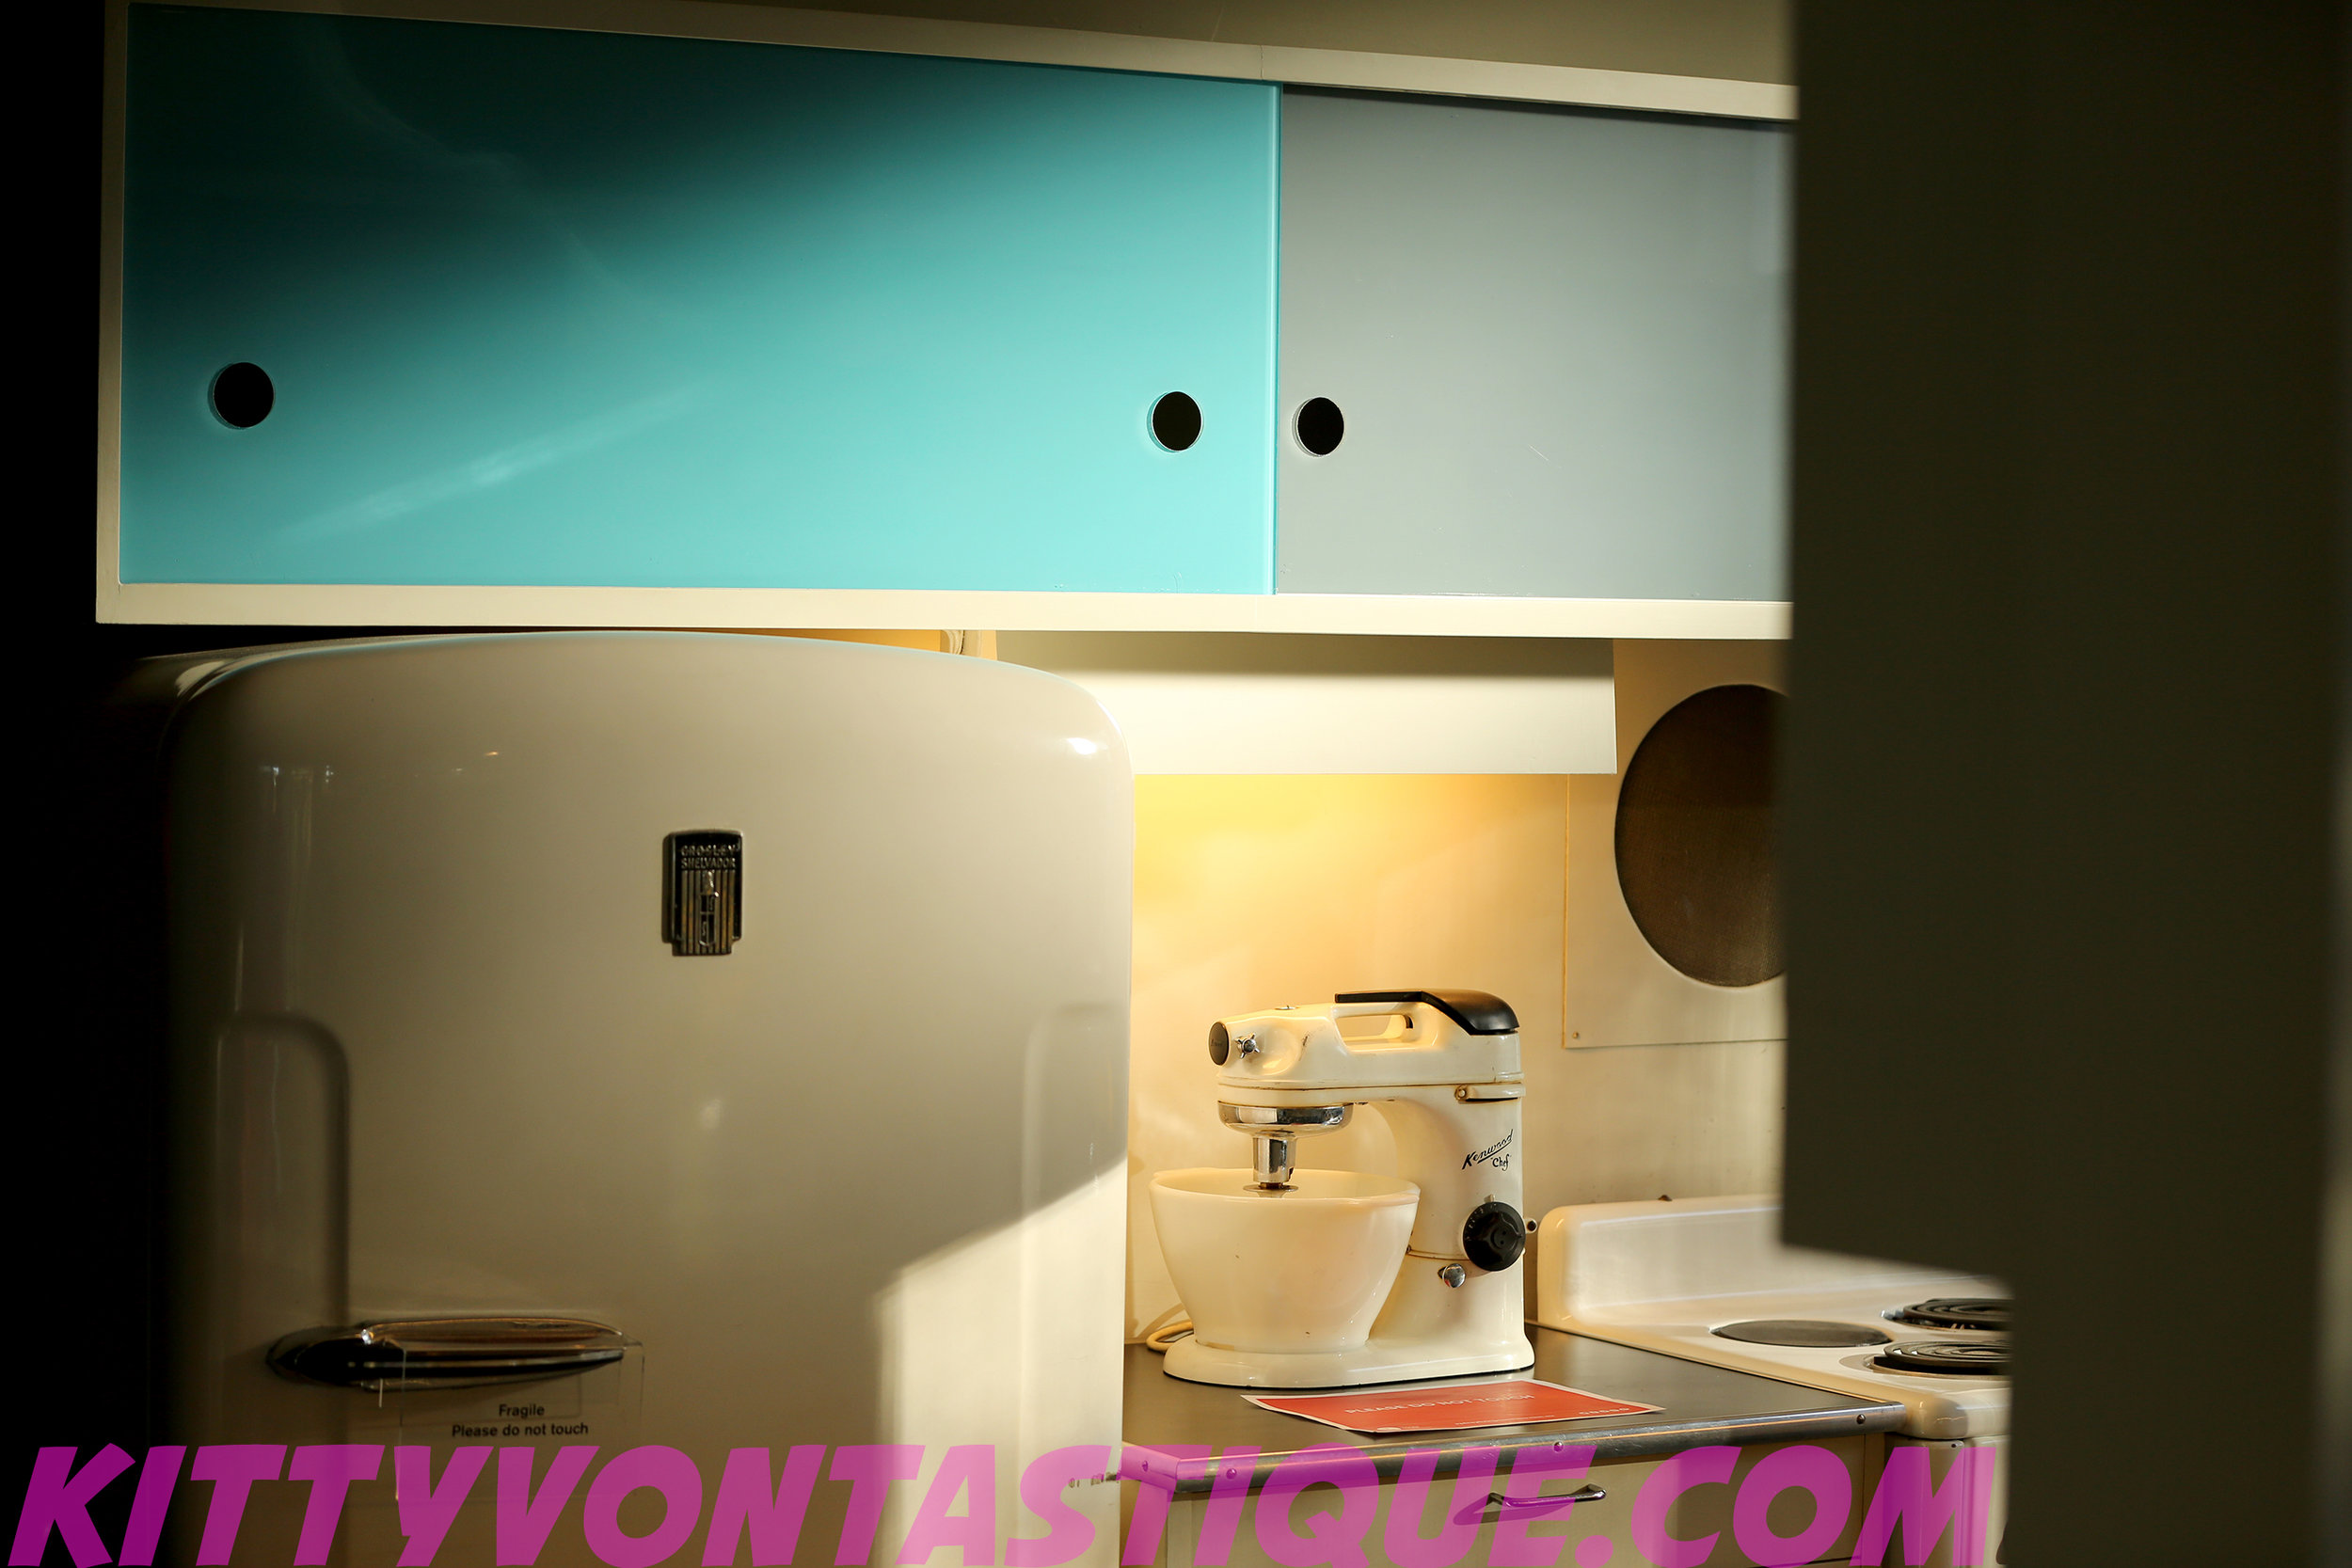 House_Interiors_3 copy.jpg